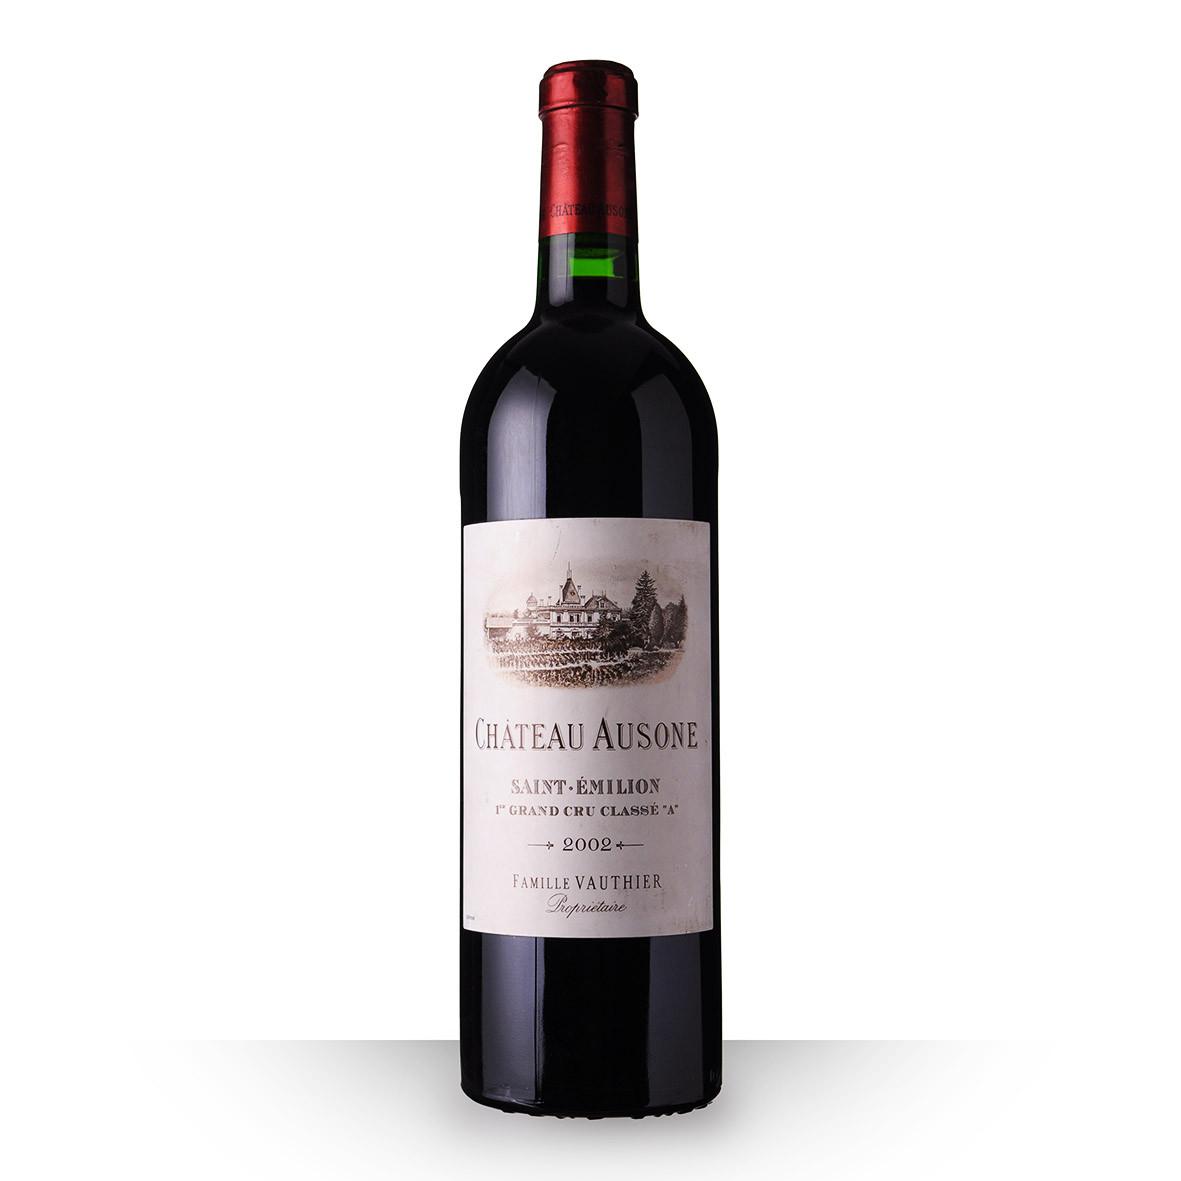 Château Ausone Saint-Emilion Grand Cru Rouge 2002 75cl www.odyssee-vins.com